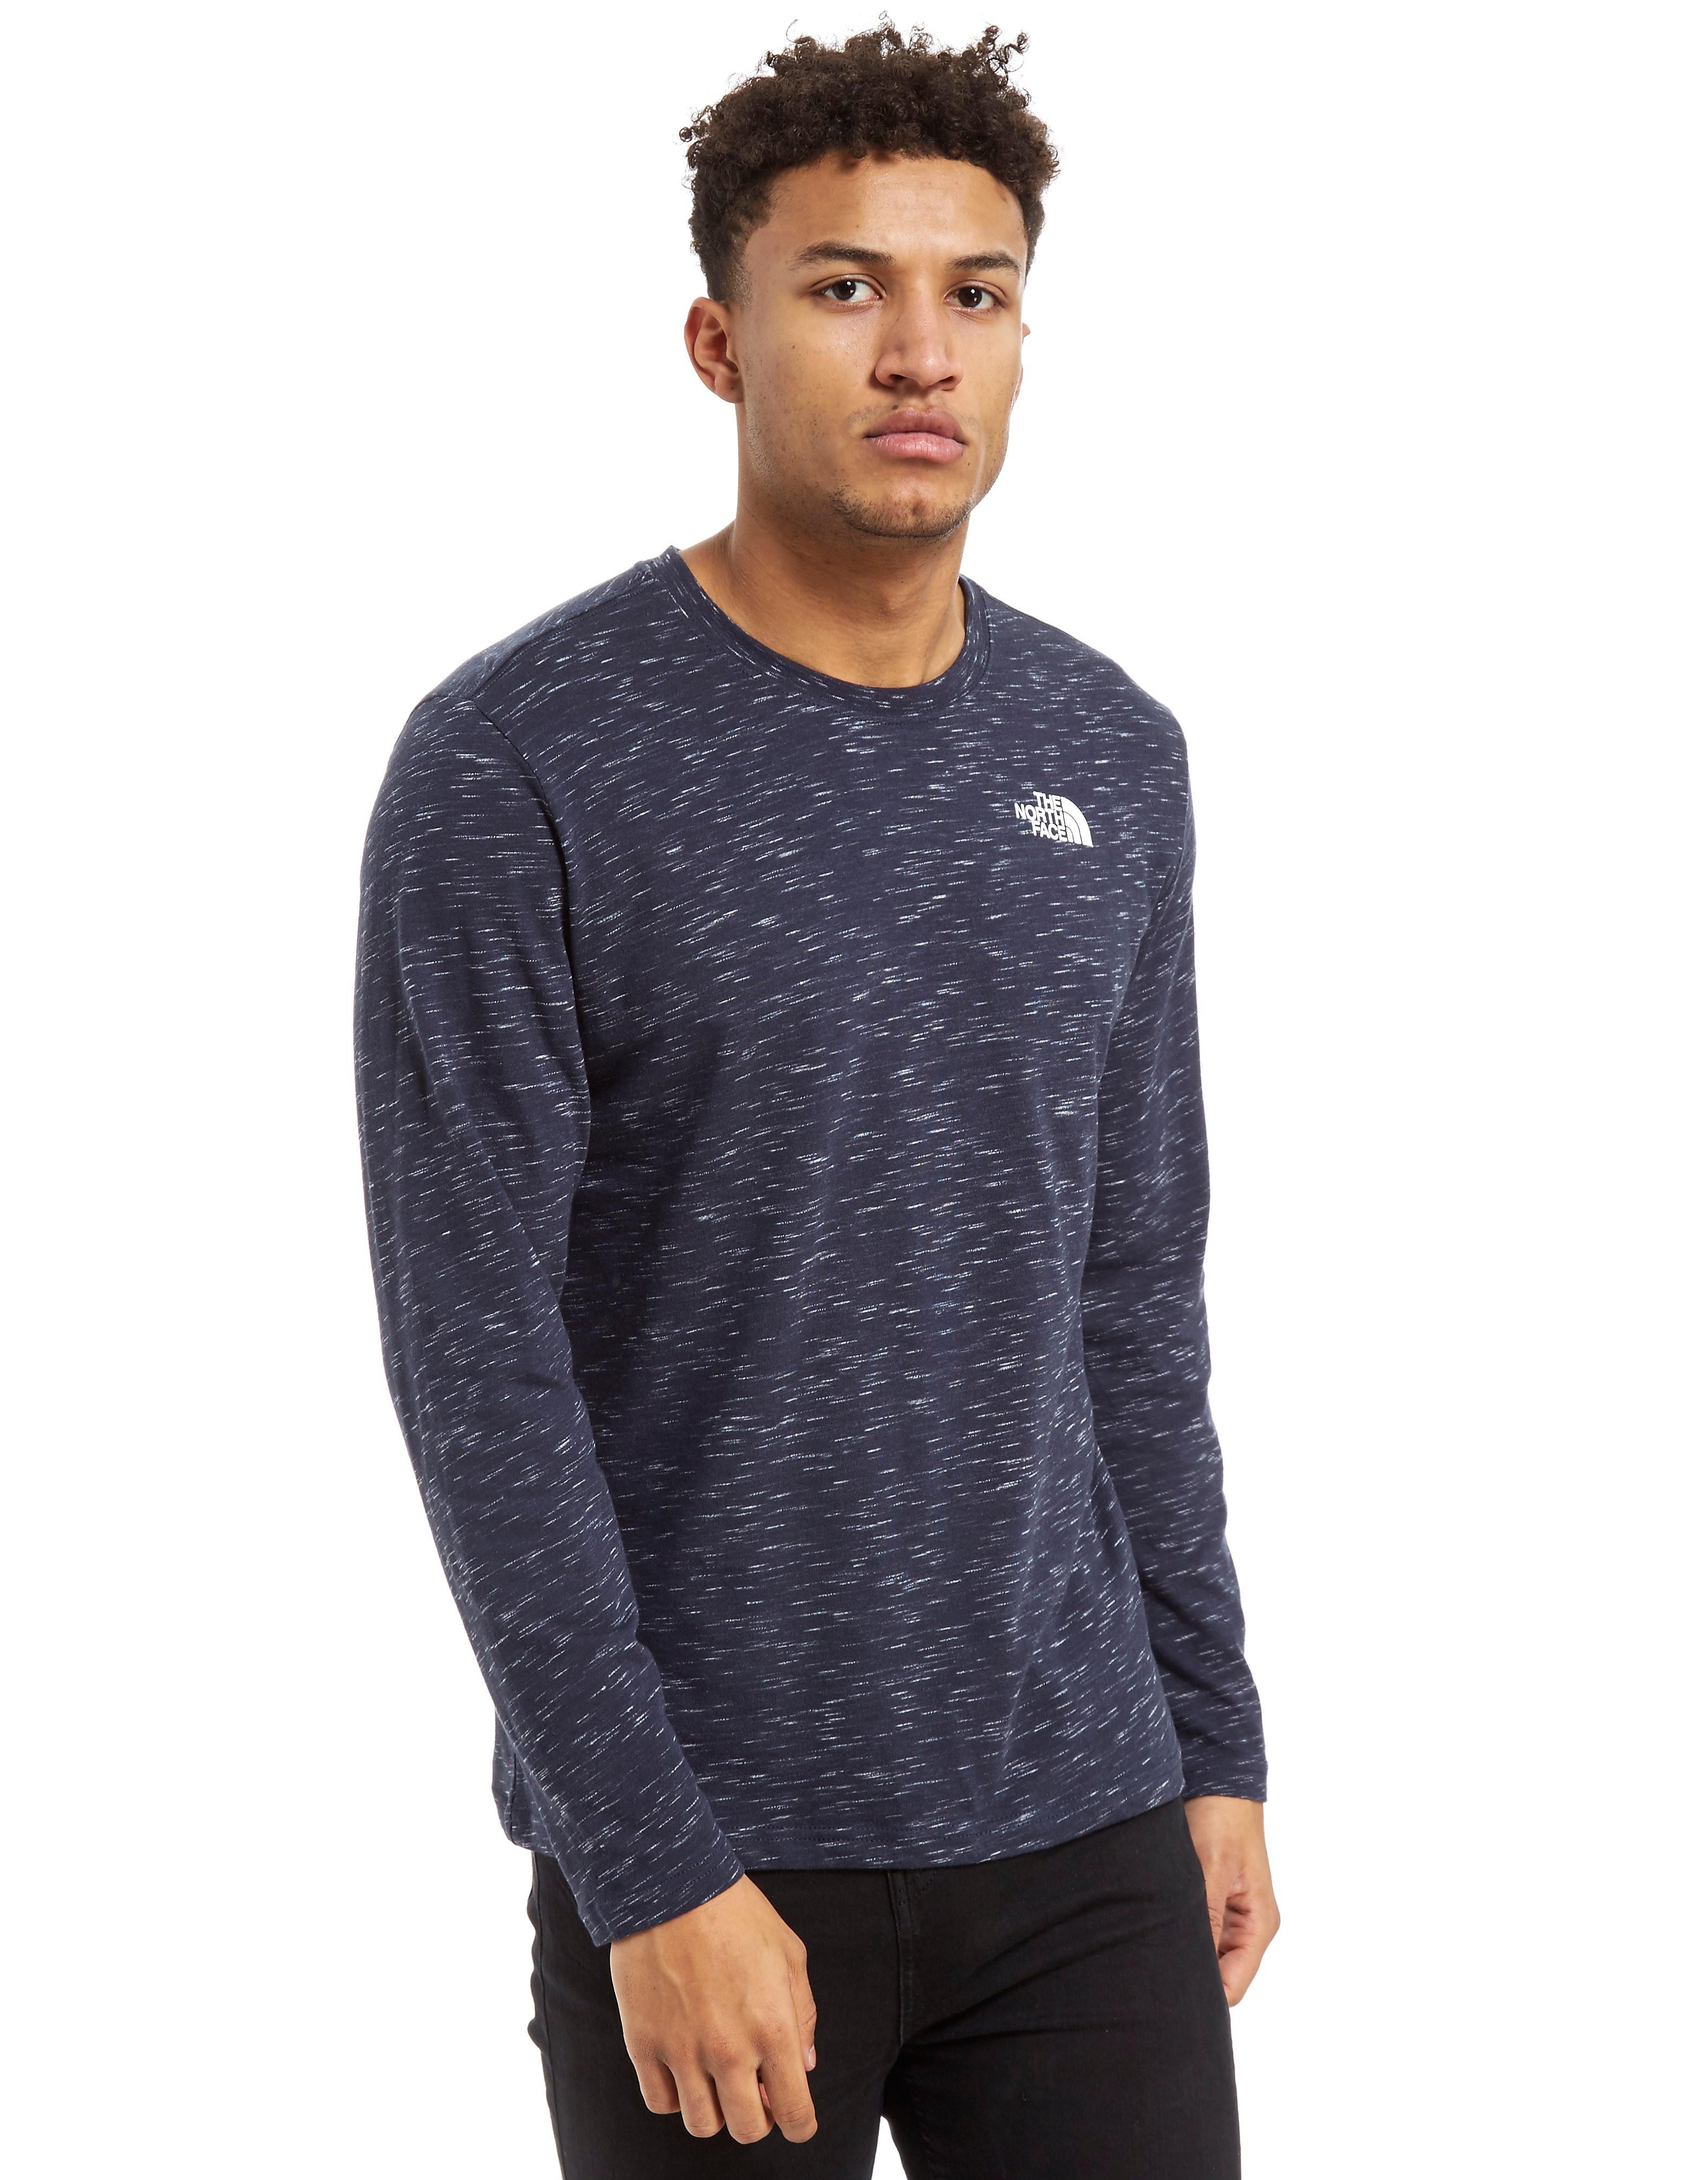 The North Face Long Sleeve Box T-Shirt